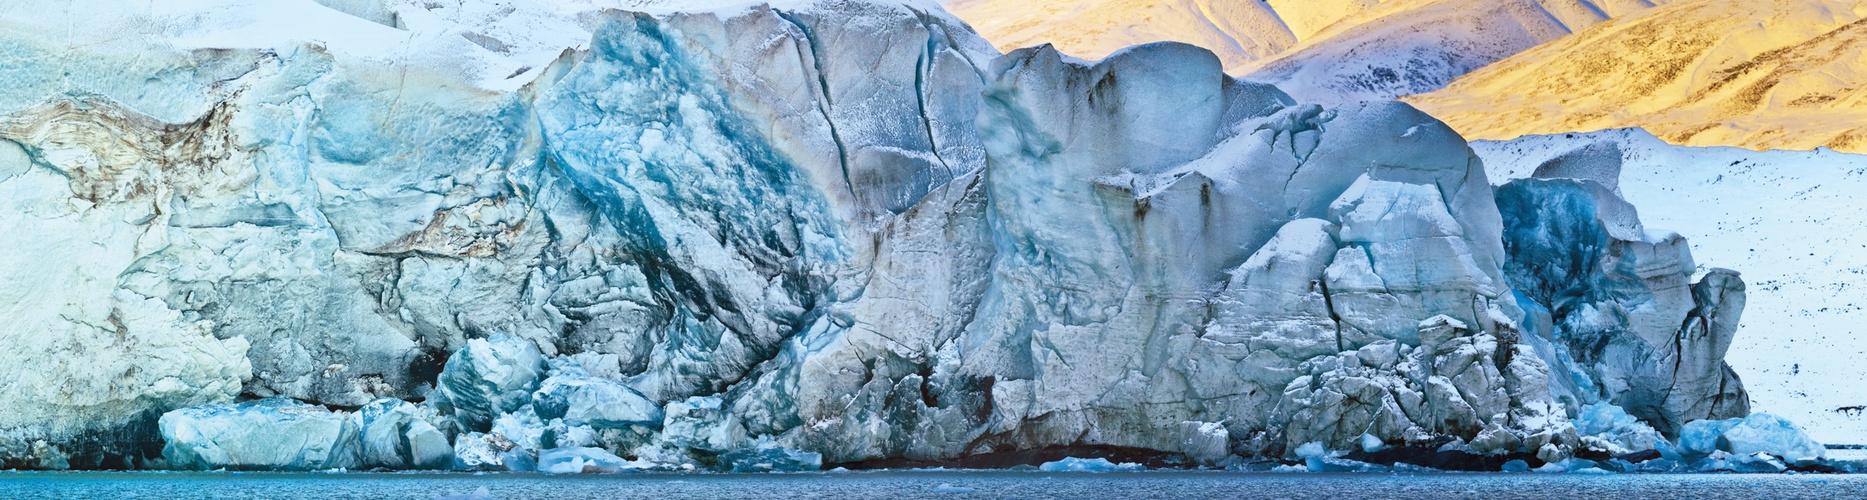 Sefströmbreen, Spitzbergen im Oktober 2013